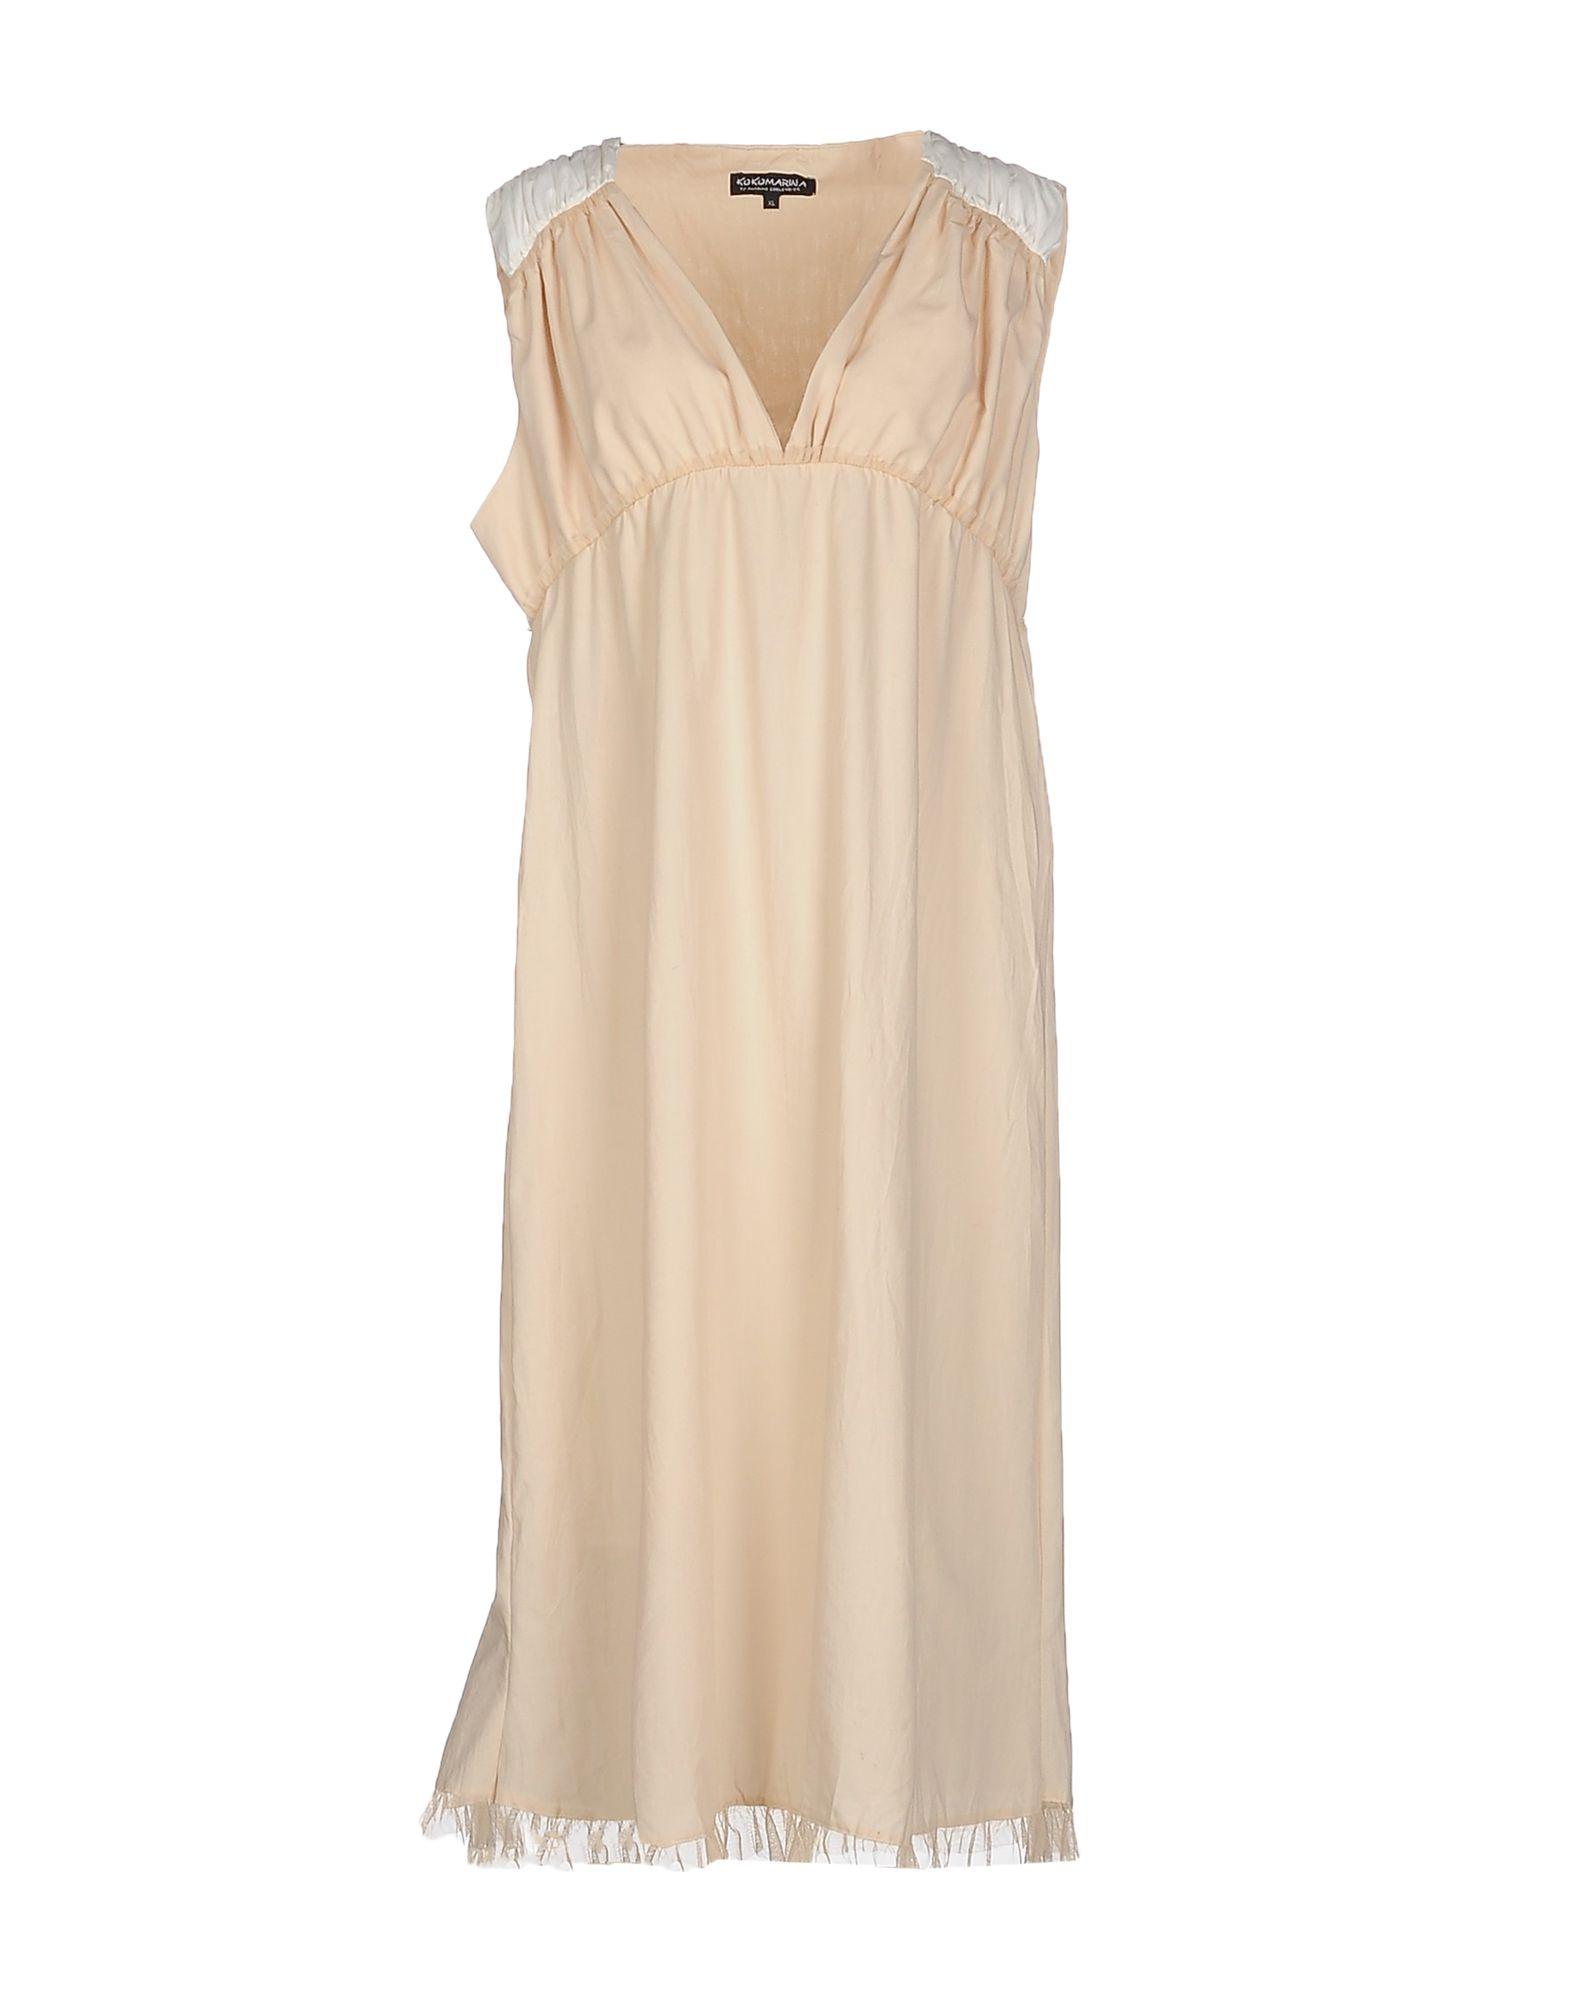 KOKOMARINA by ANTOINE COELENBIER Платье длиной 3/4 celine короткое платье